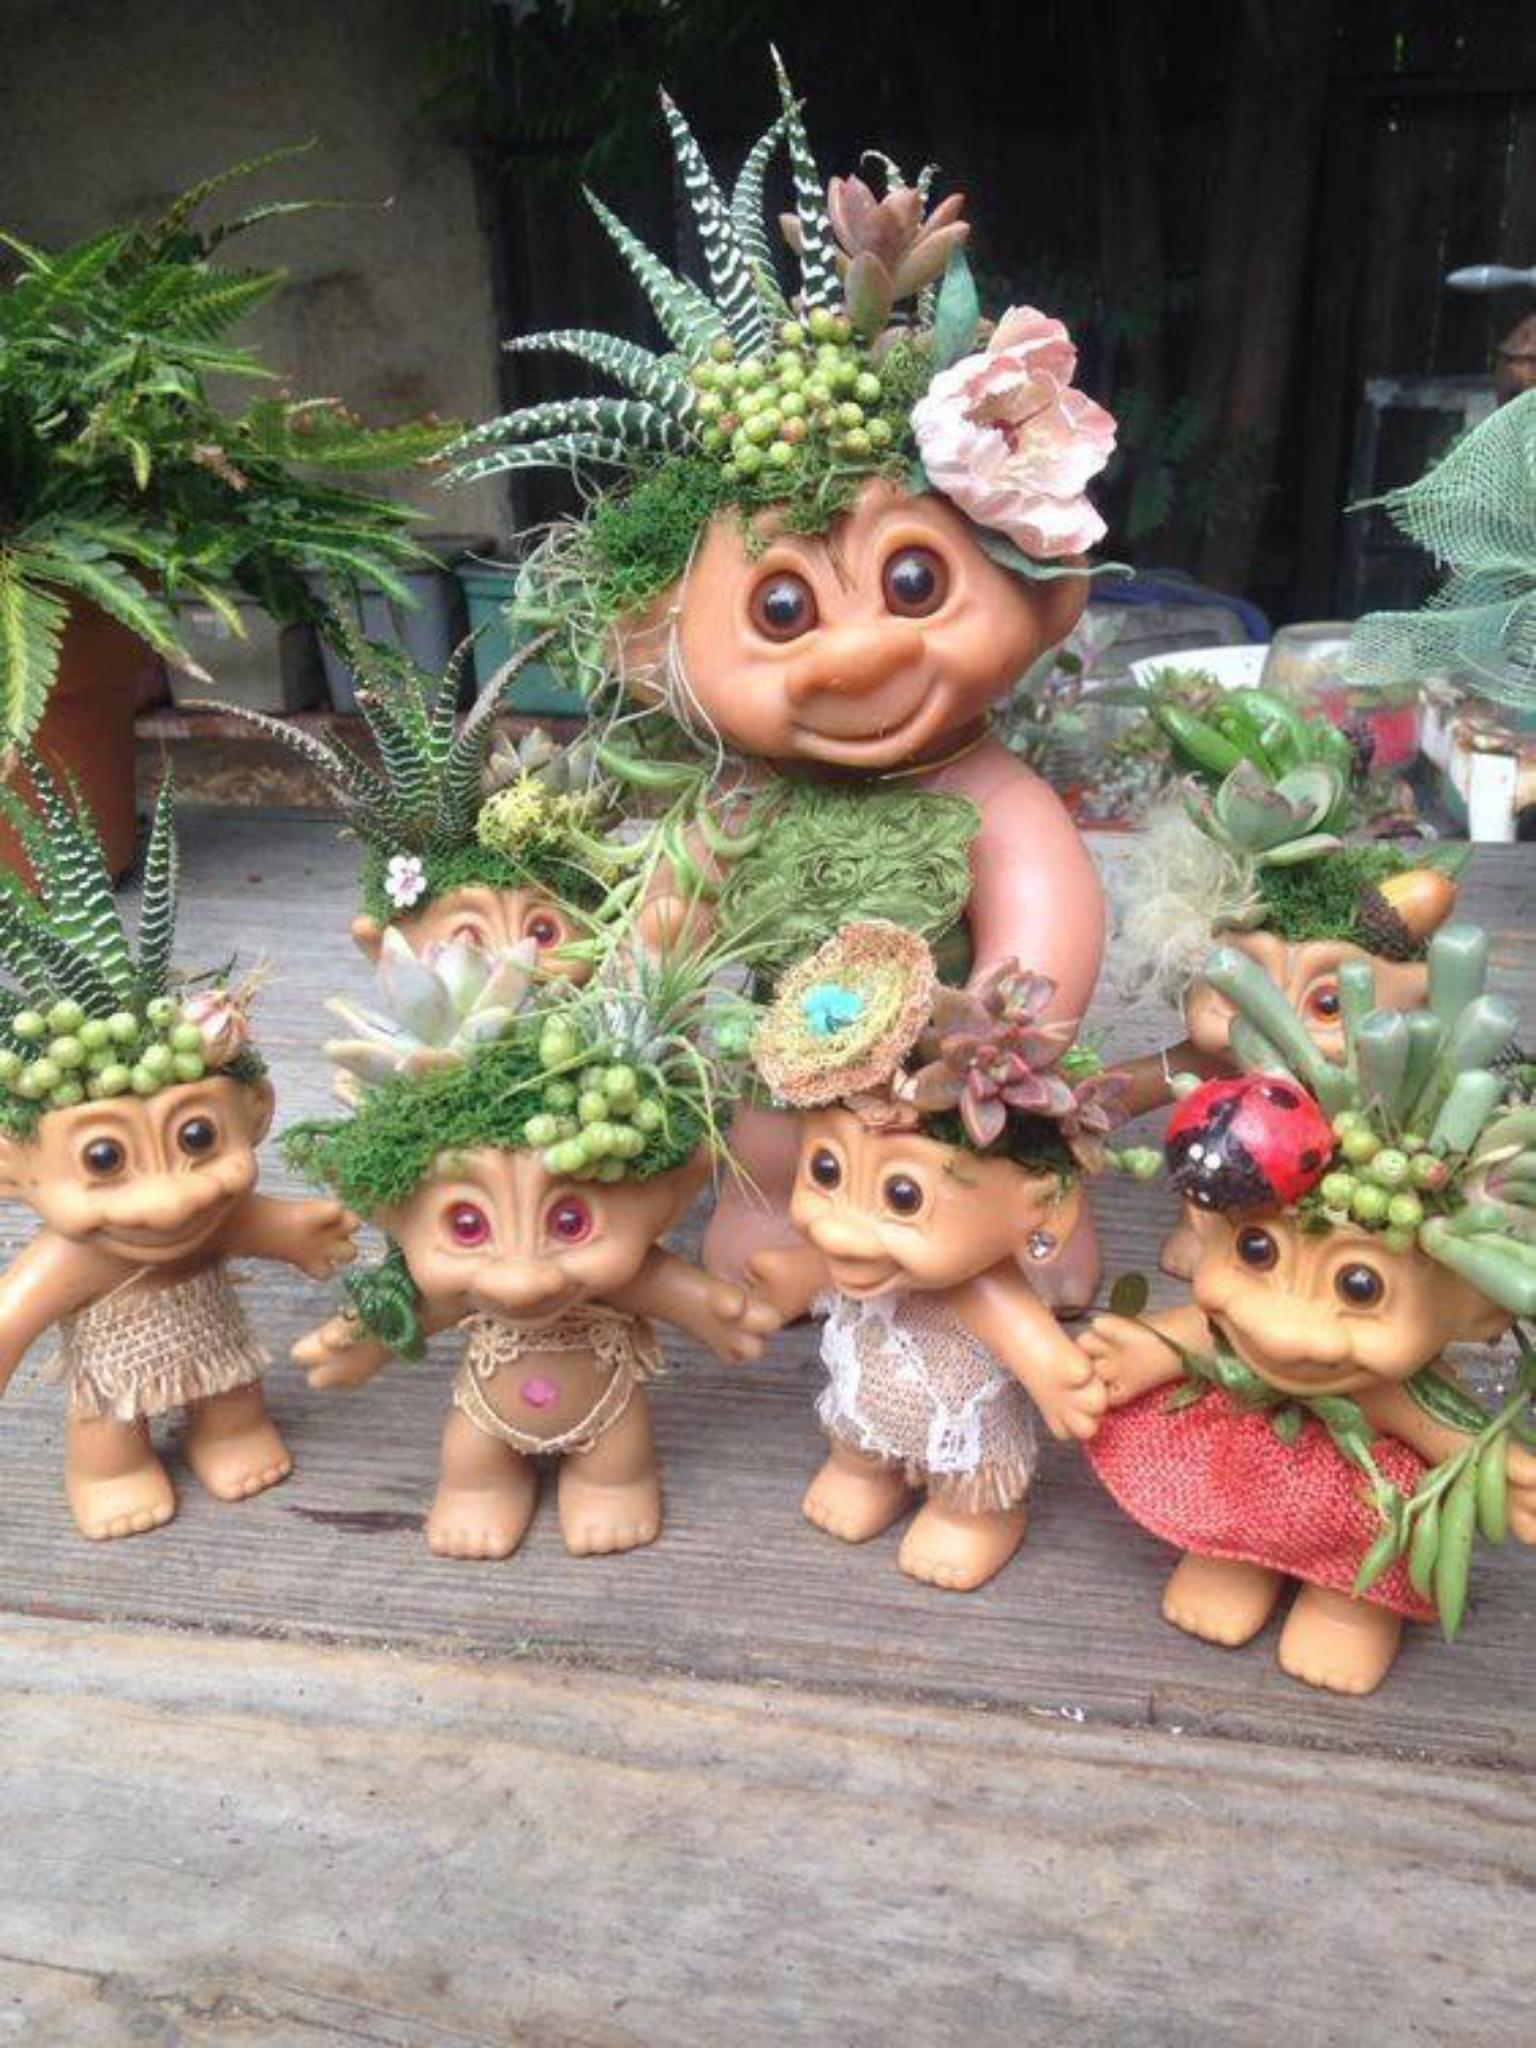 Troll dolls upcycled succulent holder #succulentterrarium